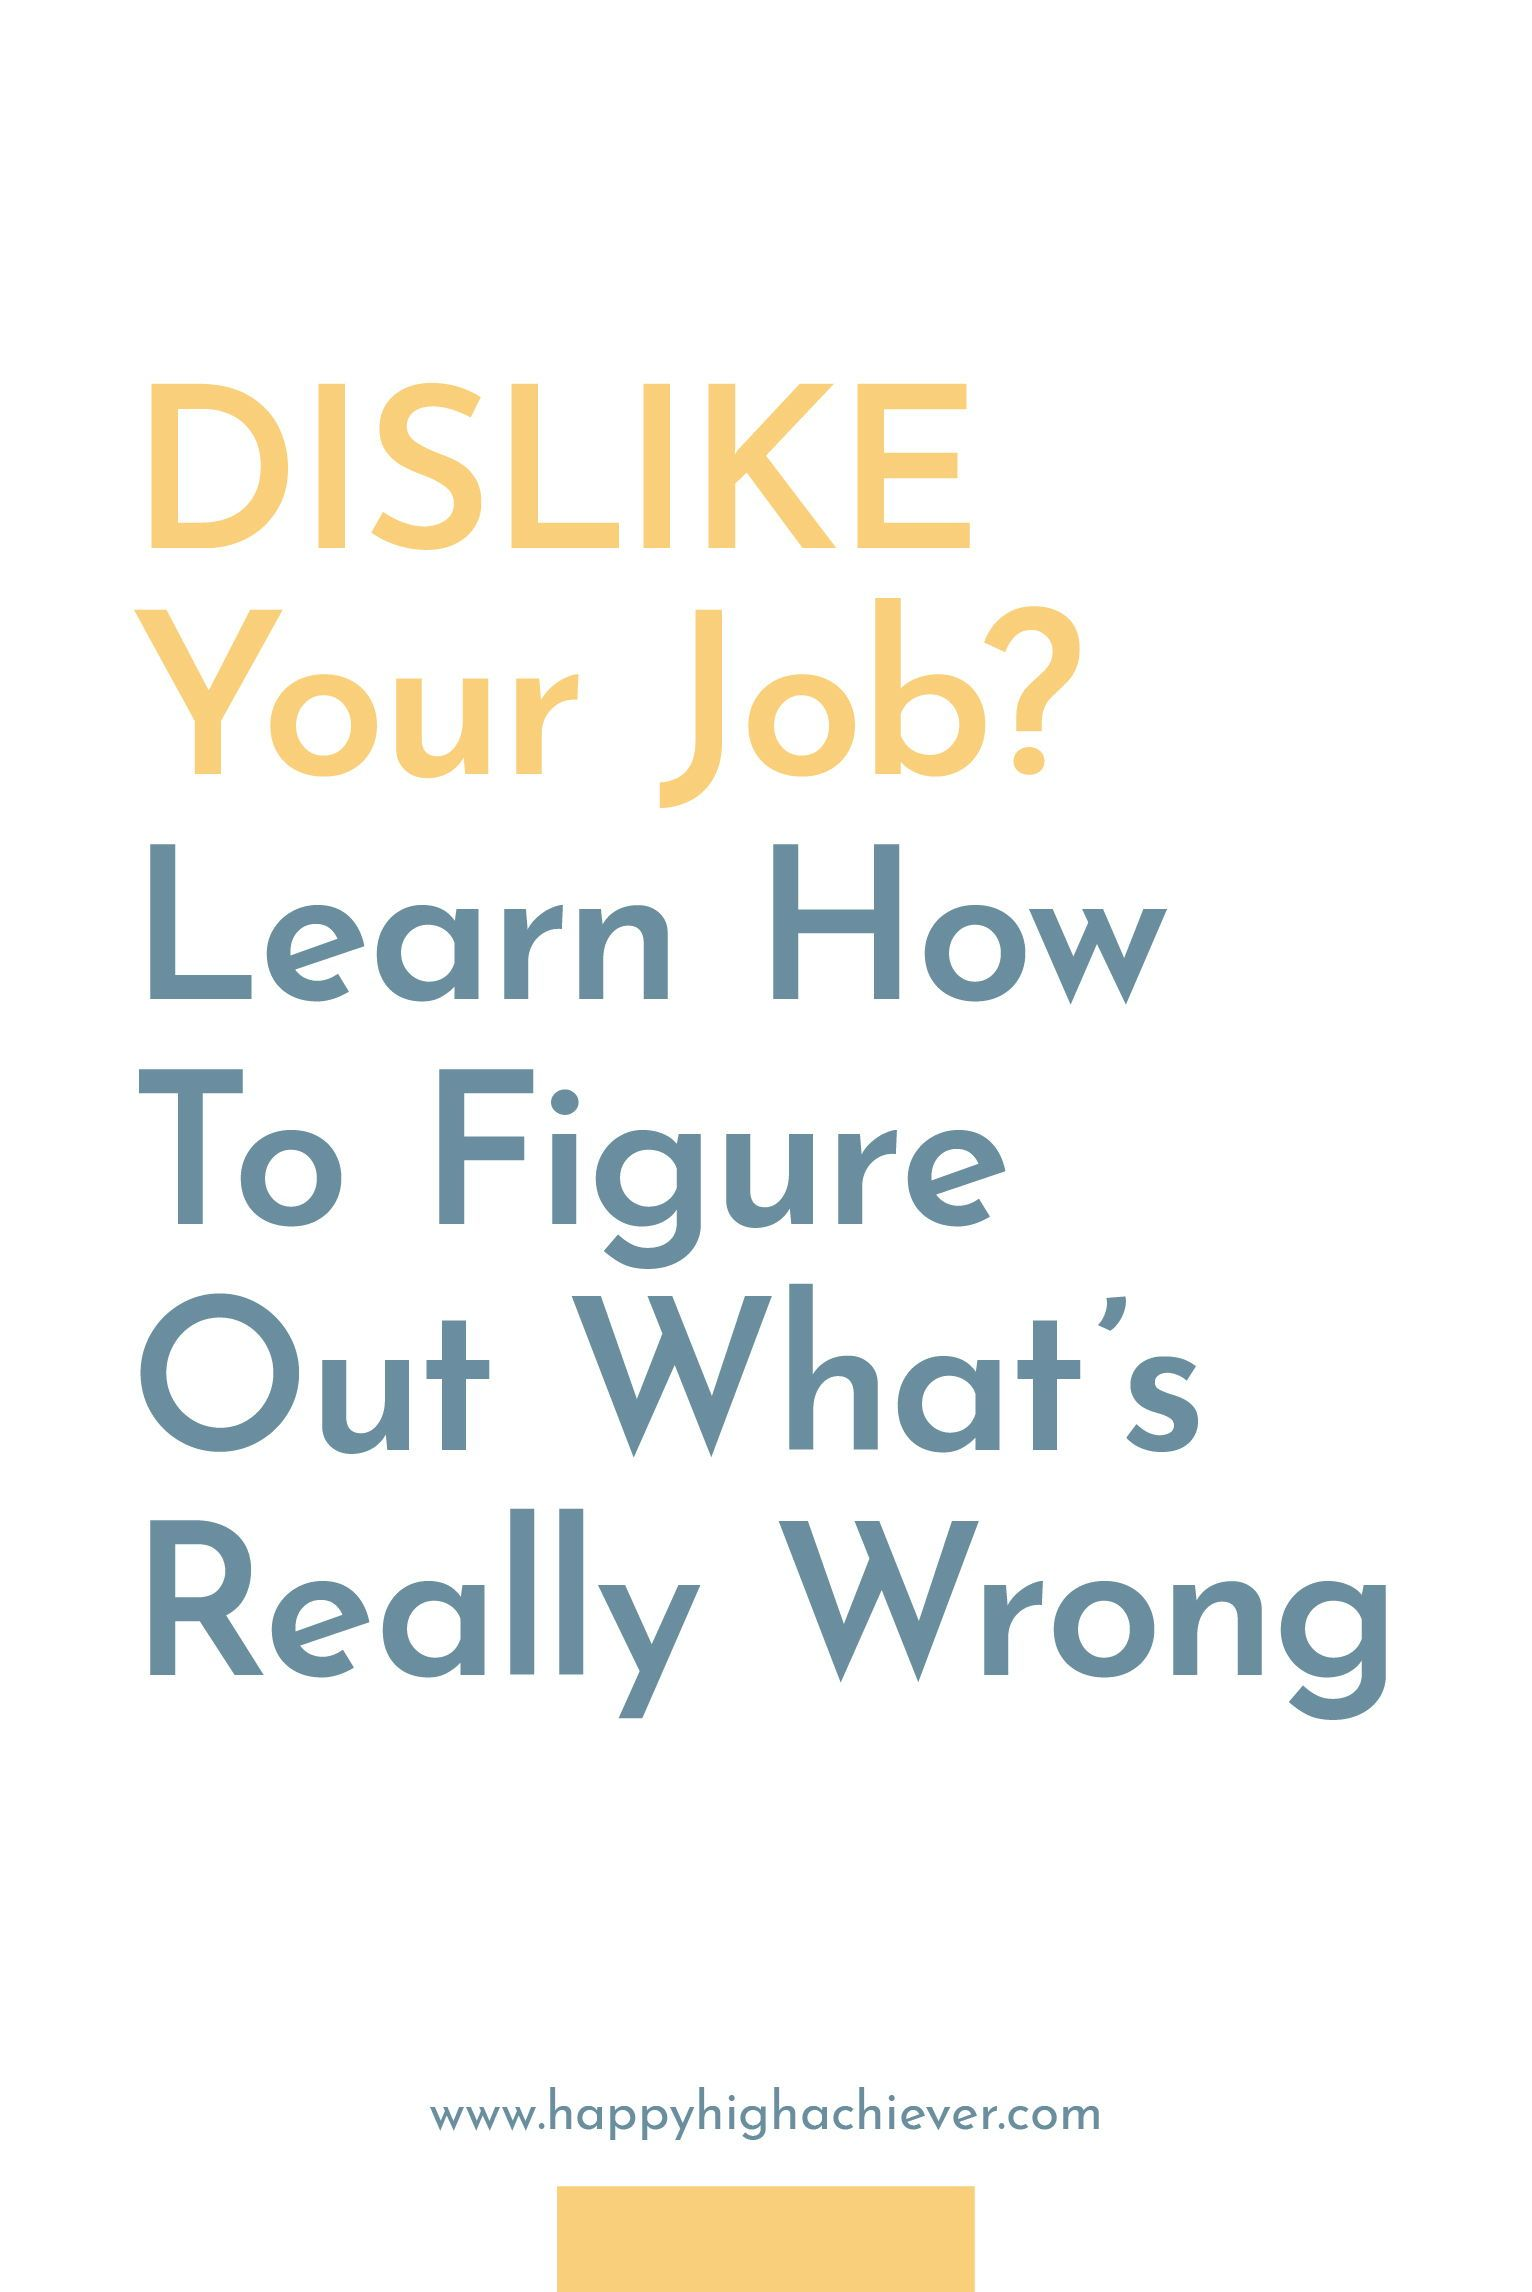 Pin on Career Tips to Establish Credibility & Leadership